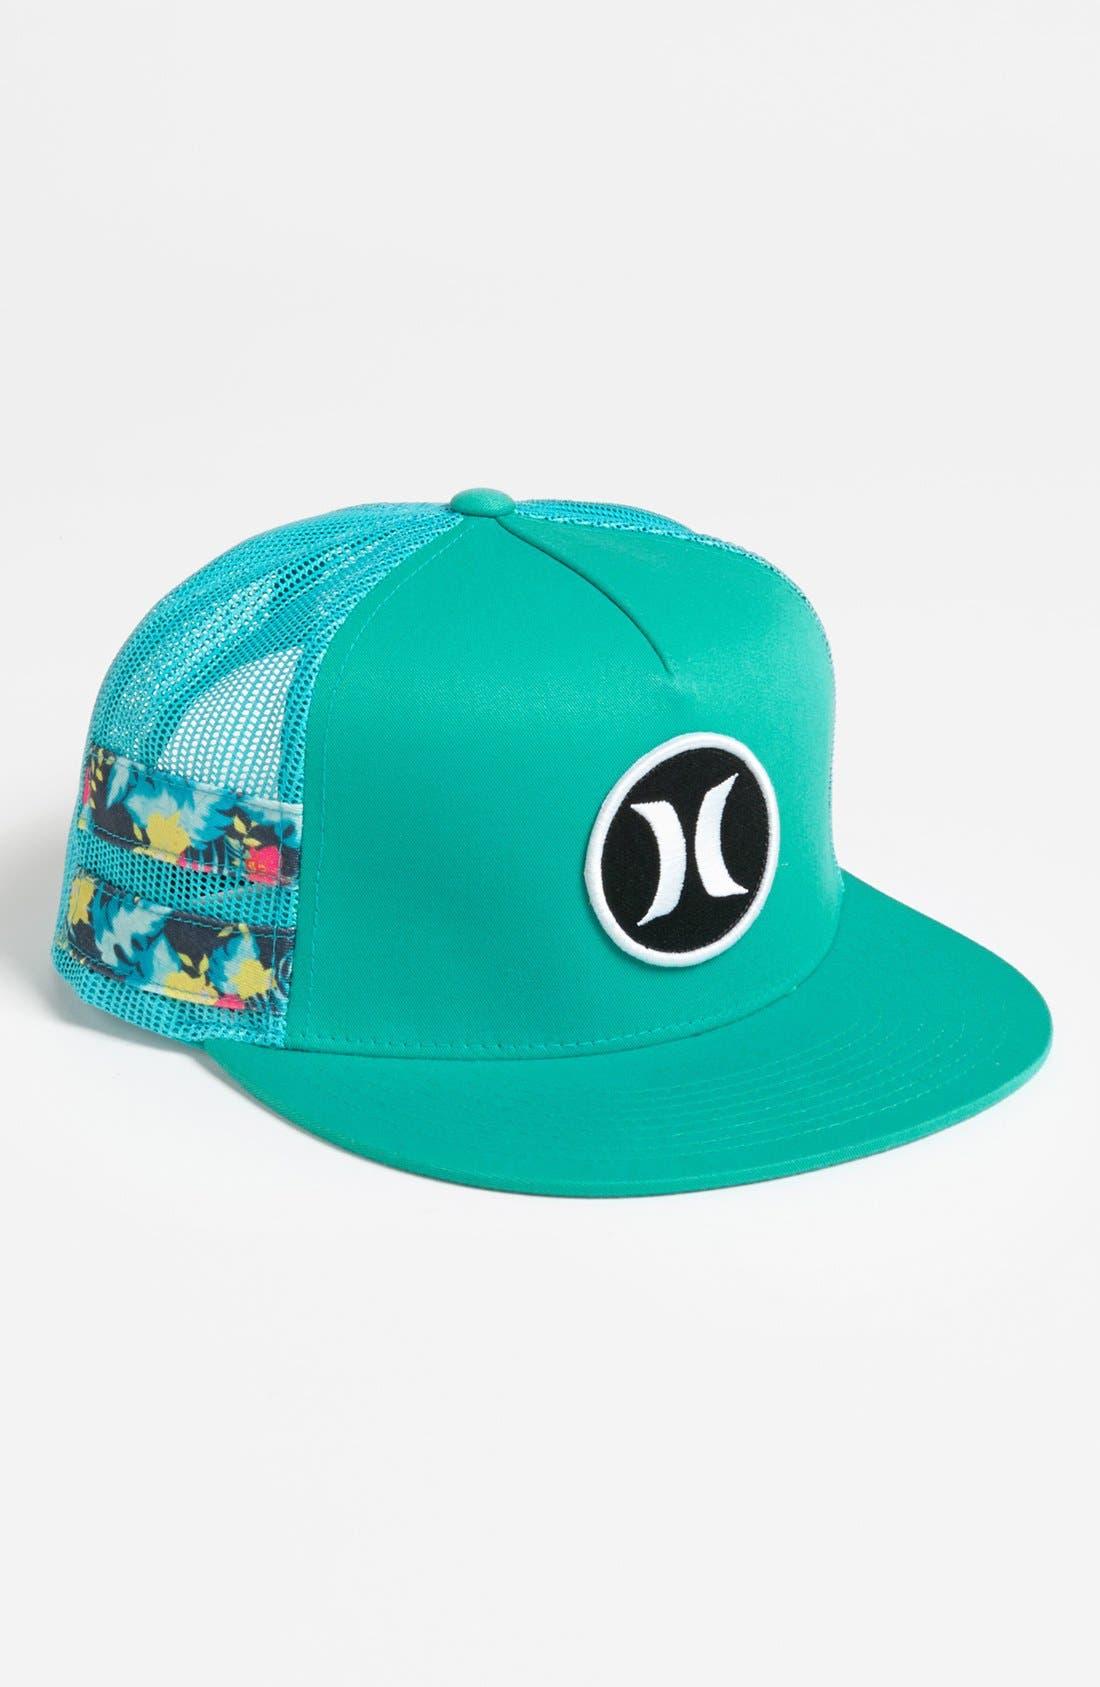 Main Image - Hurley 'Block Party' Trucker Hat